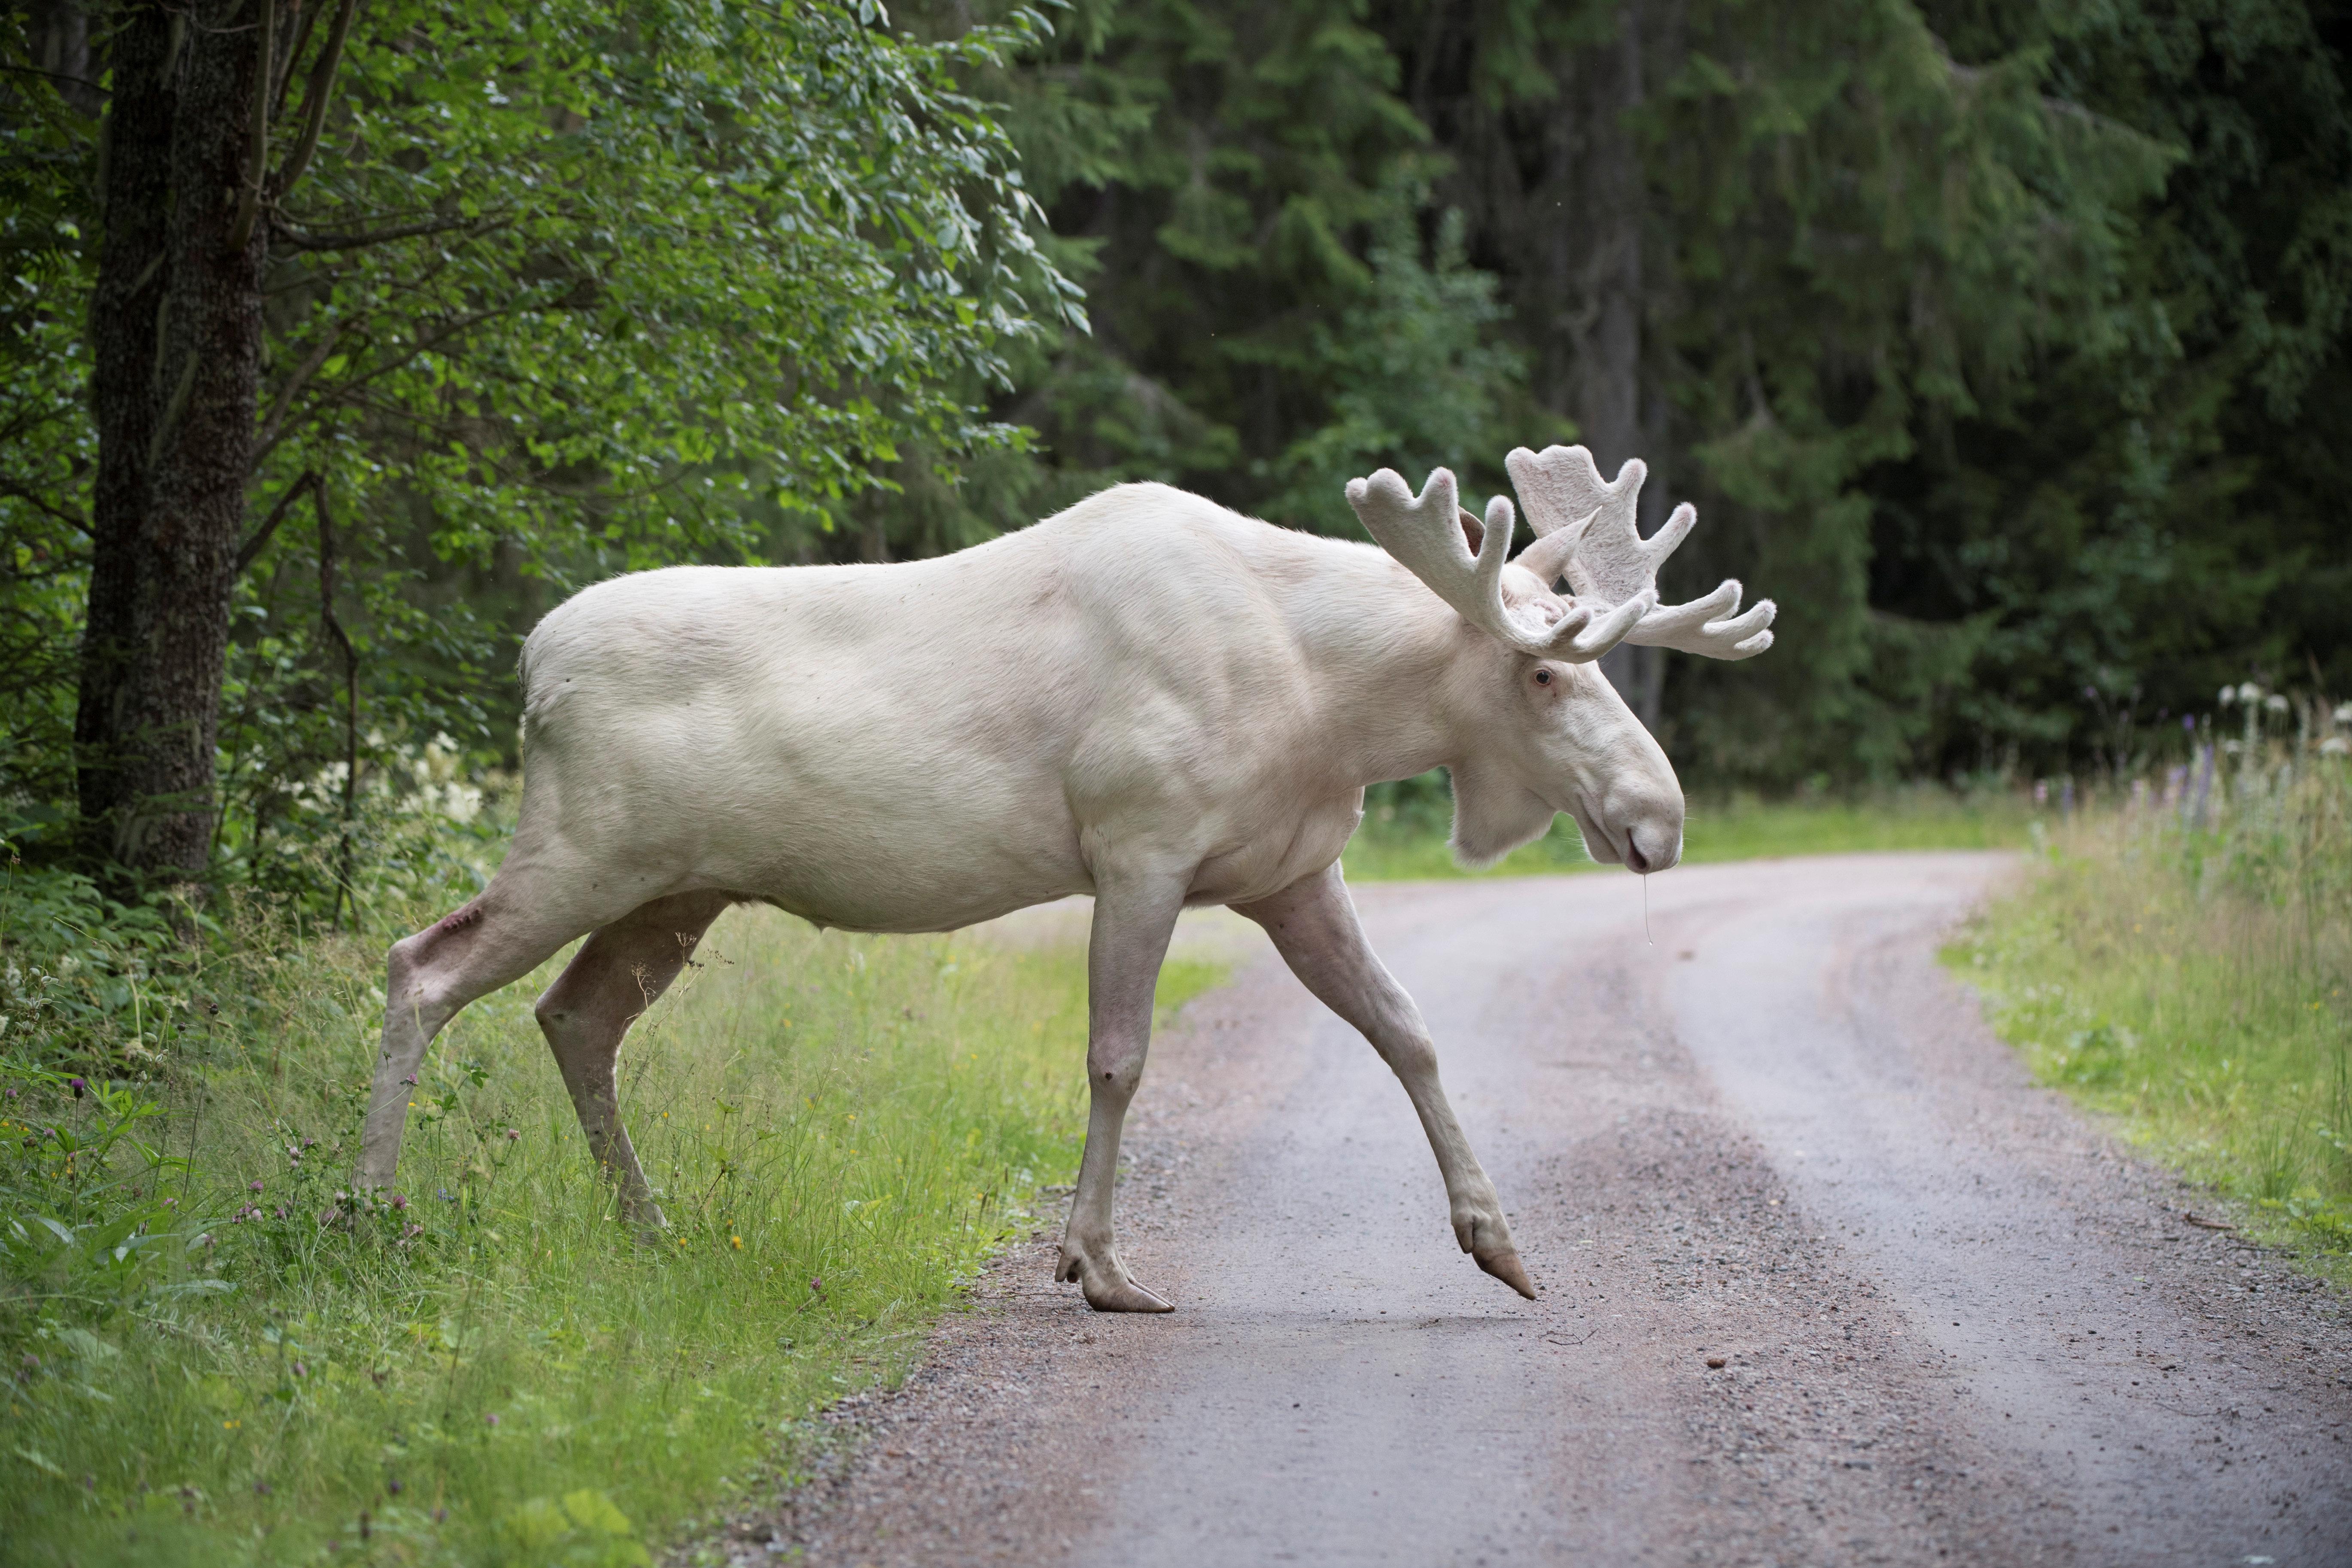 A rare white moose is seen in Gunnarskog, Varmland, Swedenon July 31st.